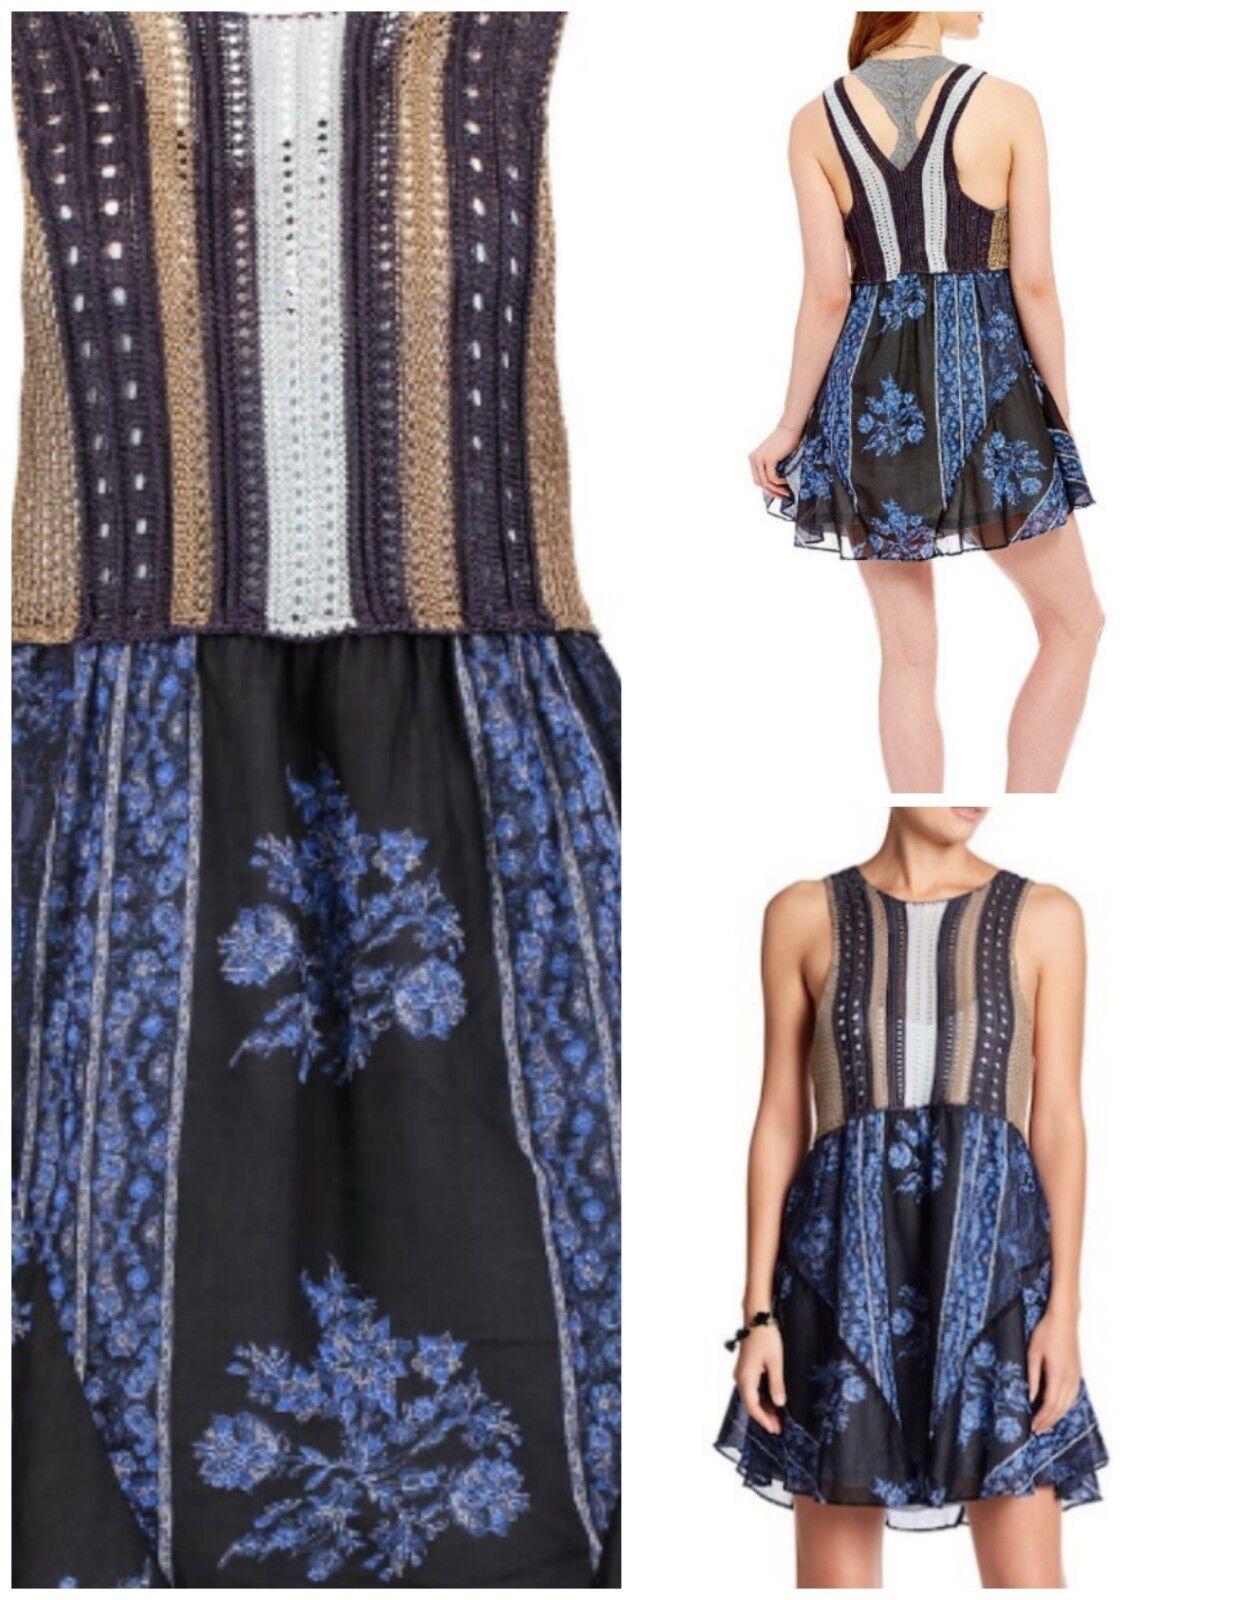 NWT NWT NWT Free People Katie's Dress Crochet Bodice M Fit Flare Mini bluee Combo  168 911b7b